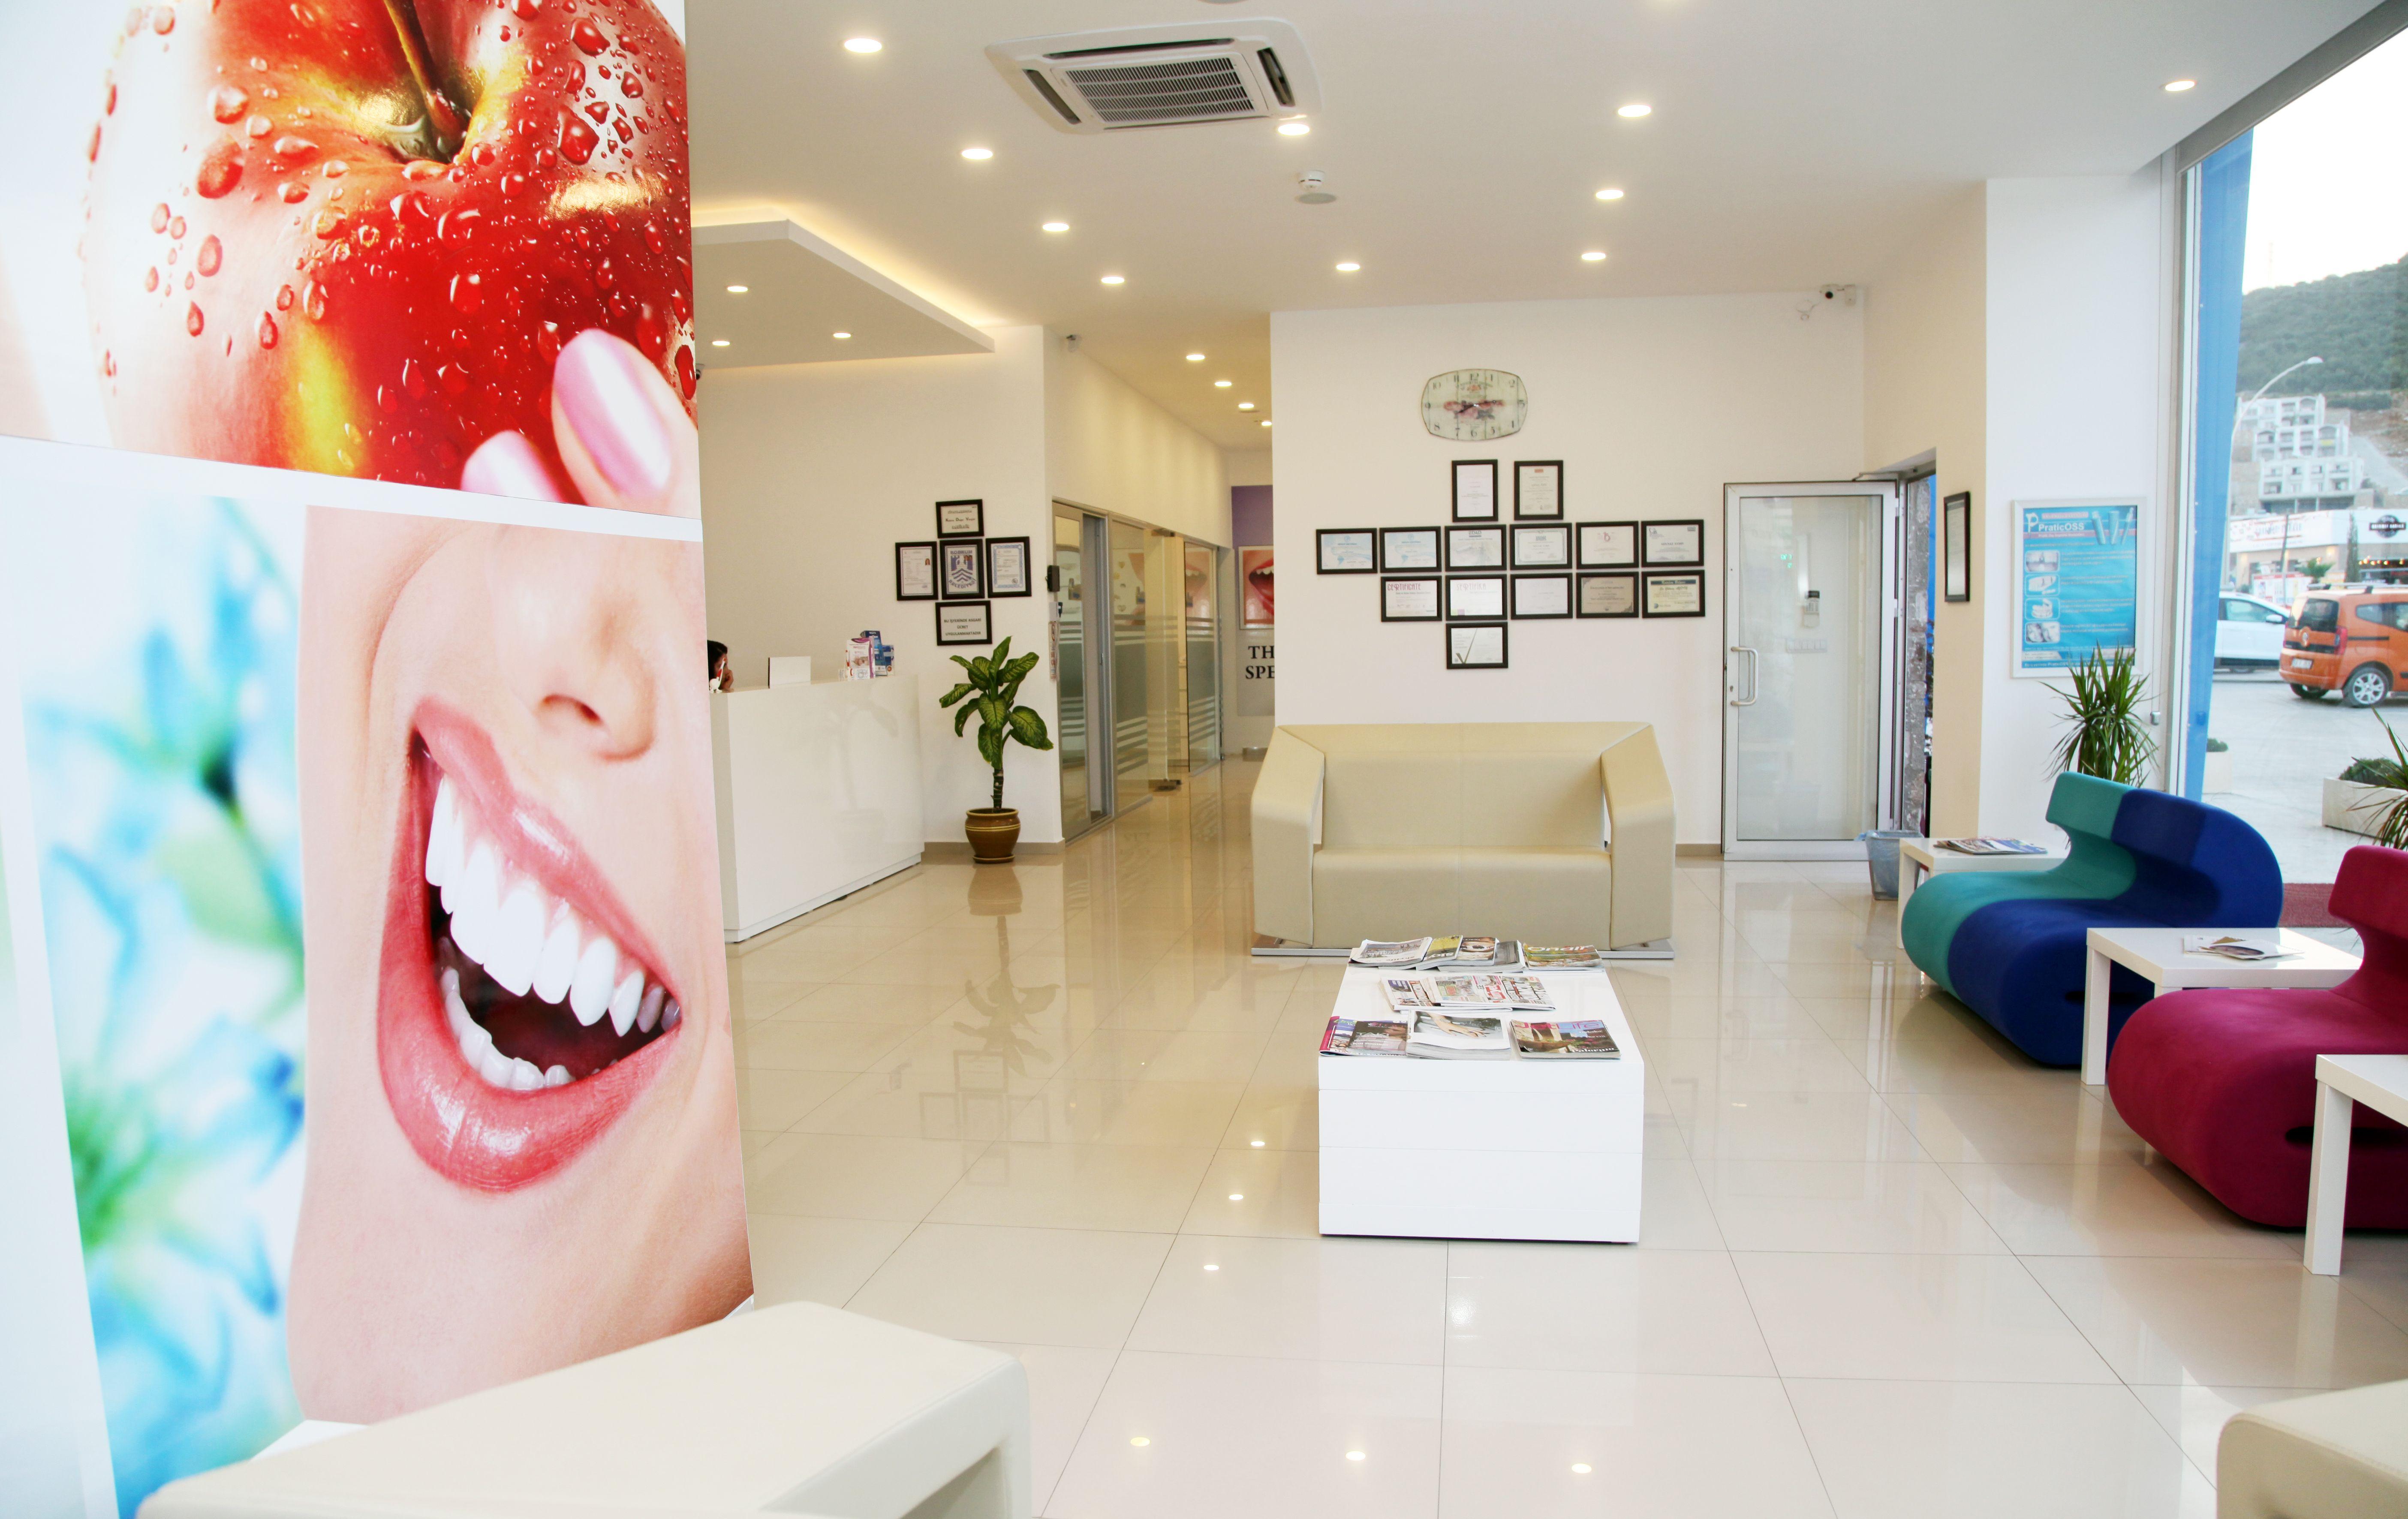 Dent Halikarnas Implantology and Cosmetic Center